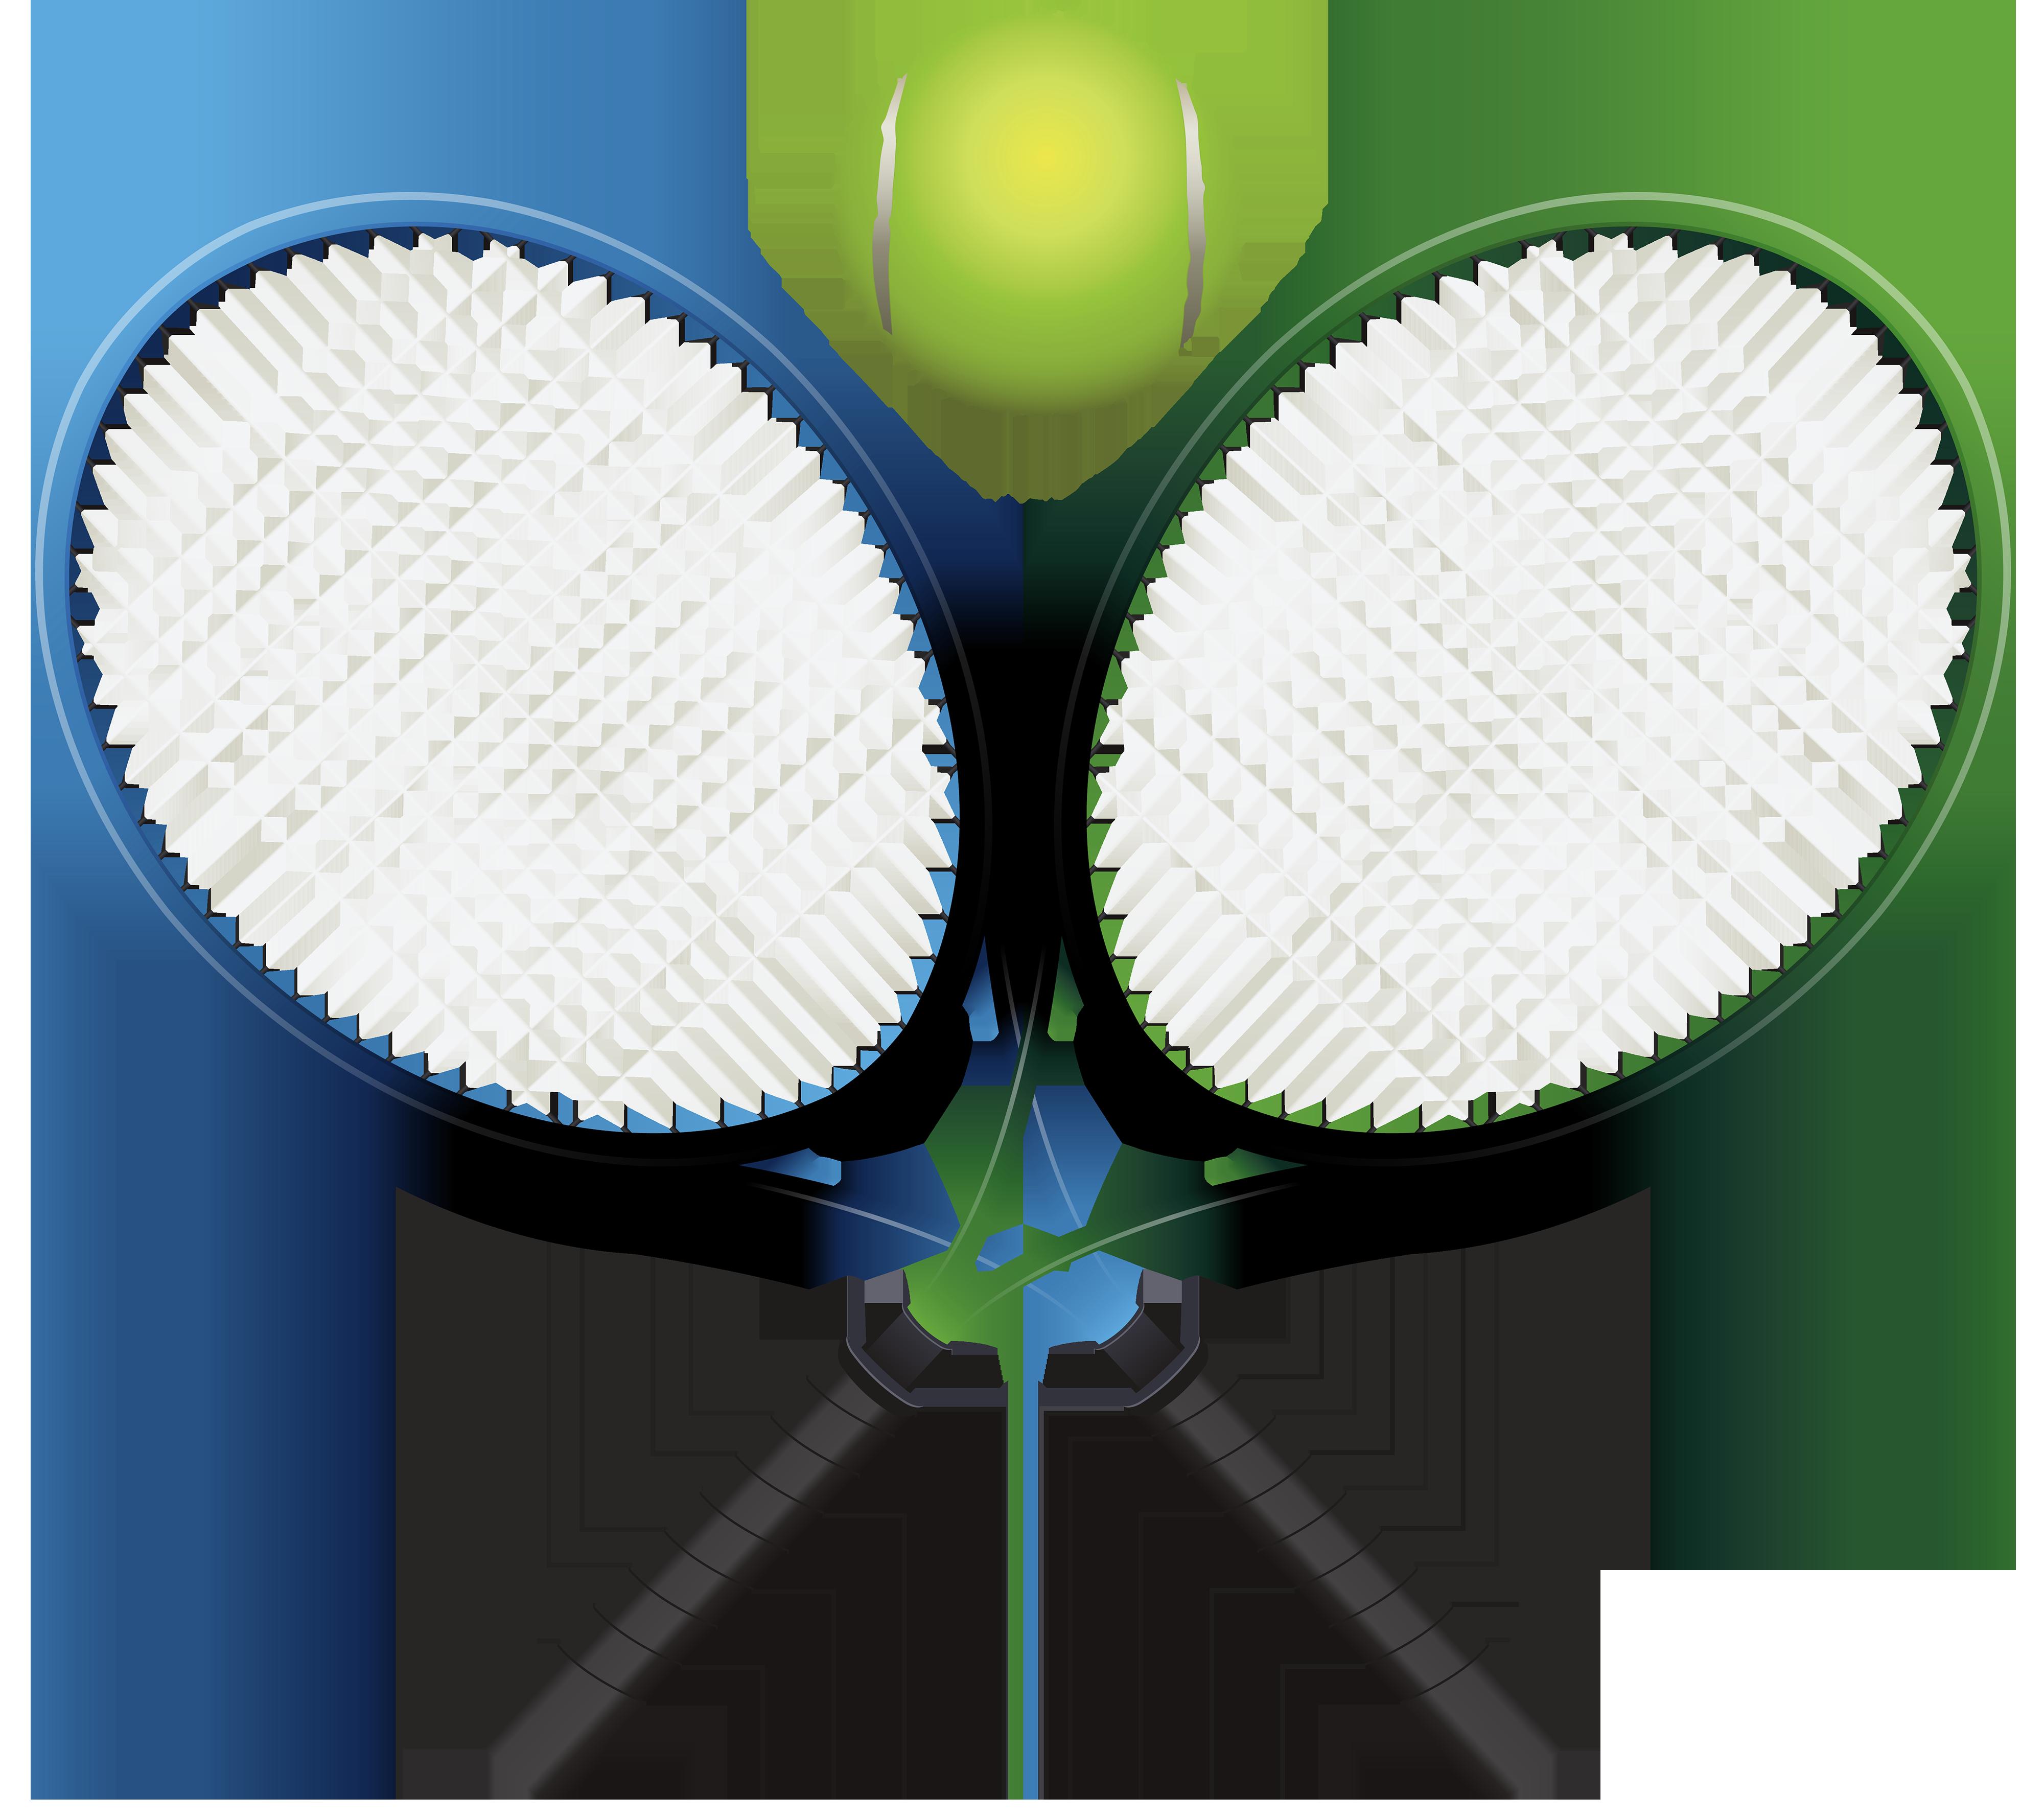 Tennis clip art crab free clipart images-Tennis clip art crab free clipart images clipartcow 2-3